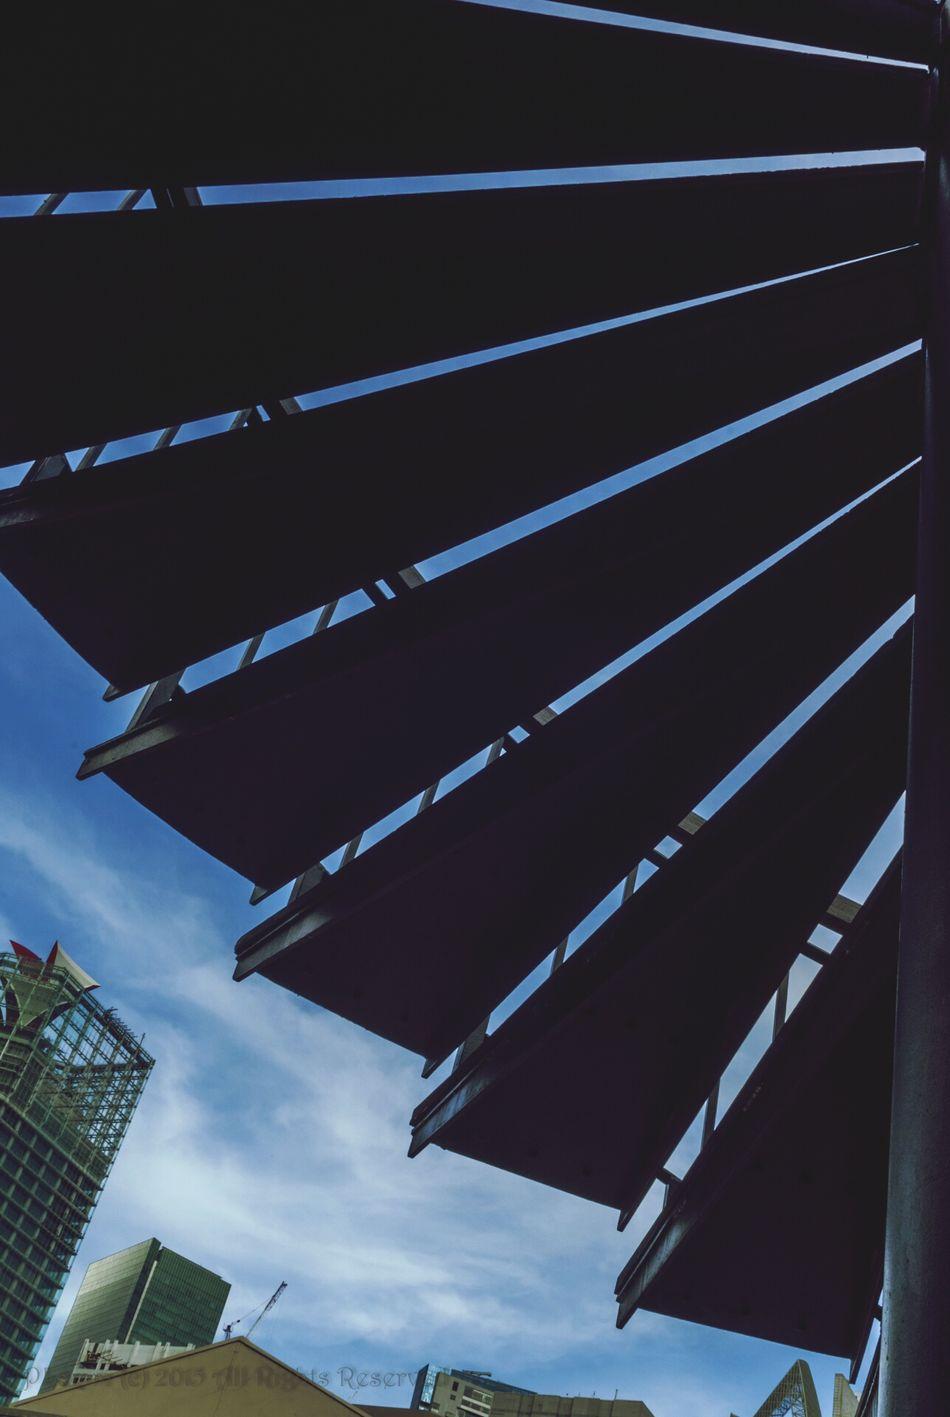 enterprise. EyeEm , EyeEmChinatownPhotowalk , Spiral , Staircase , Architecture , Skyline , Urbanexploration